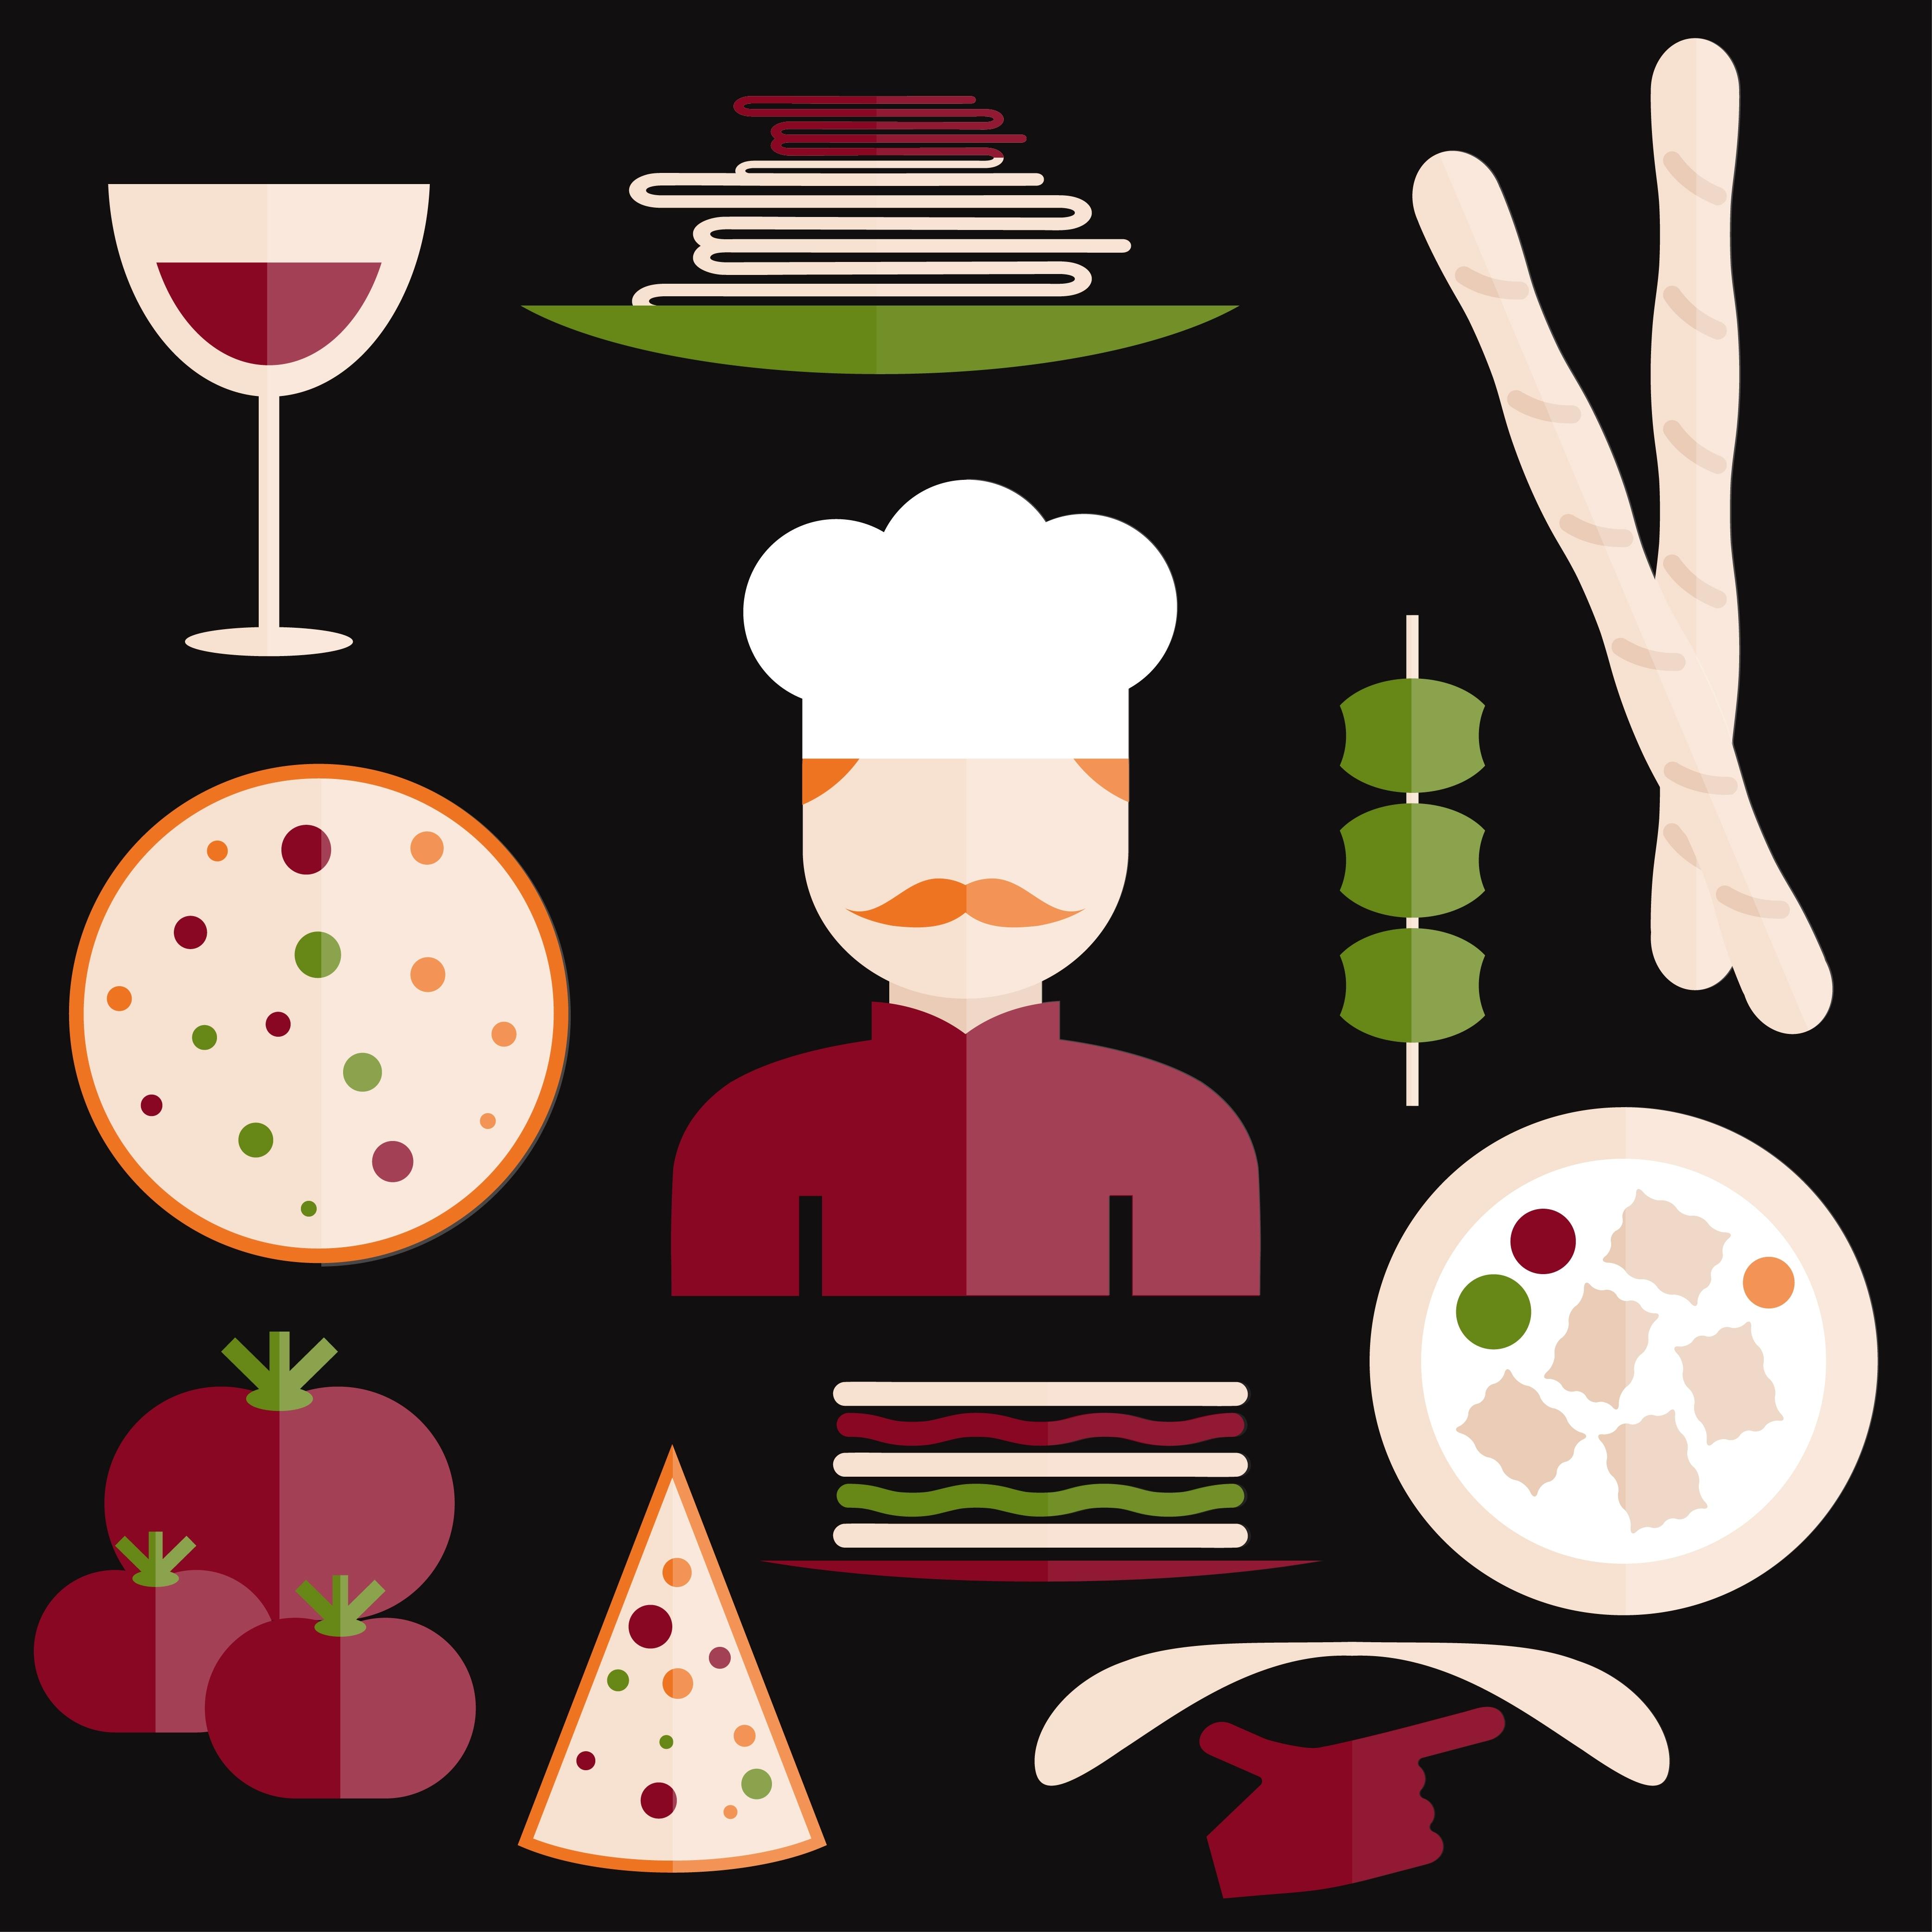 9d77905d7354372ae617_a9b42a9d60910481f06d_Food_and_Wine_2.jpg